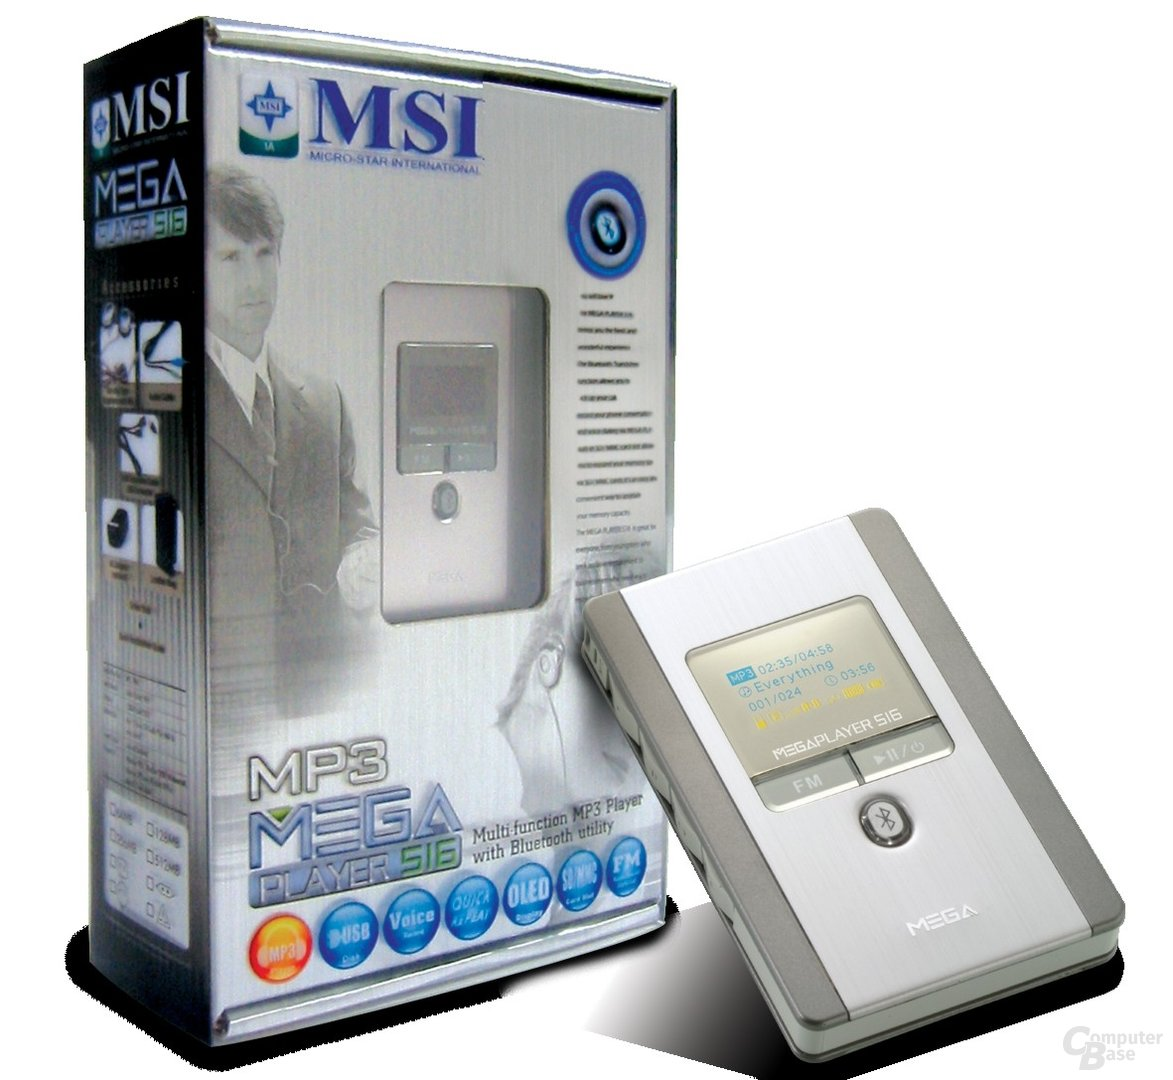 MSI MEGA Player 516BT